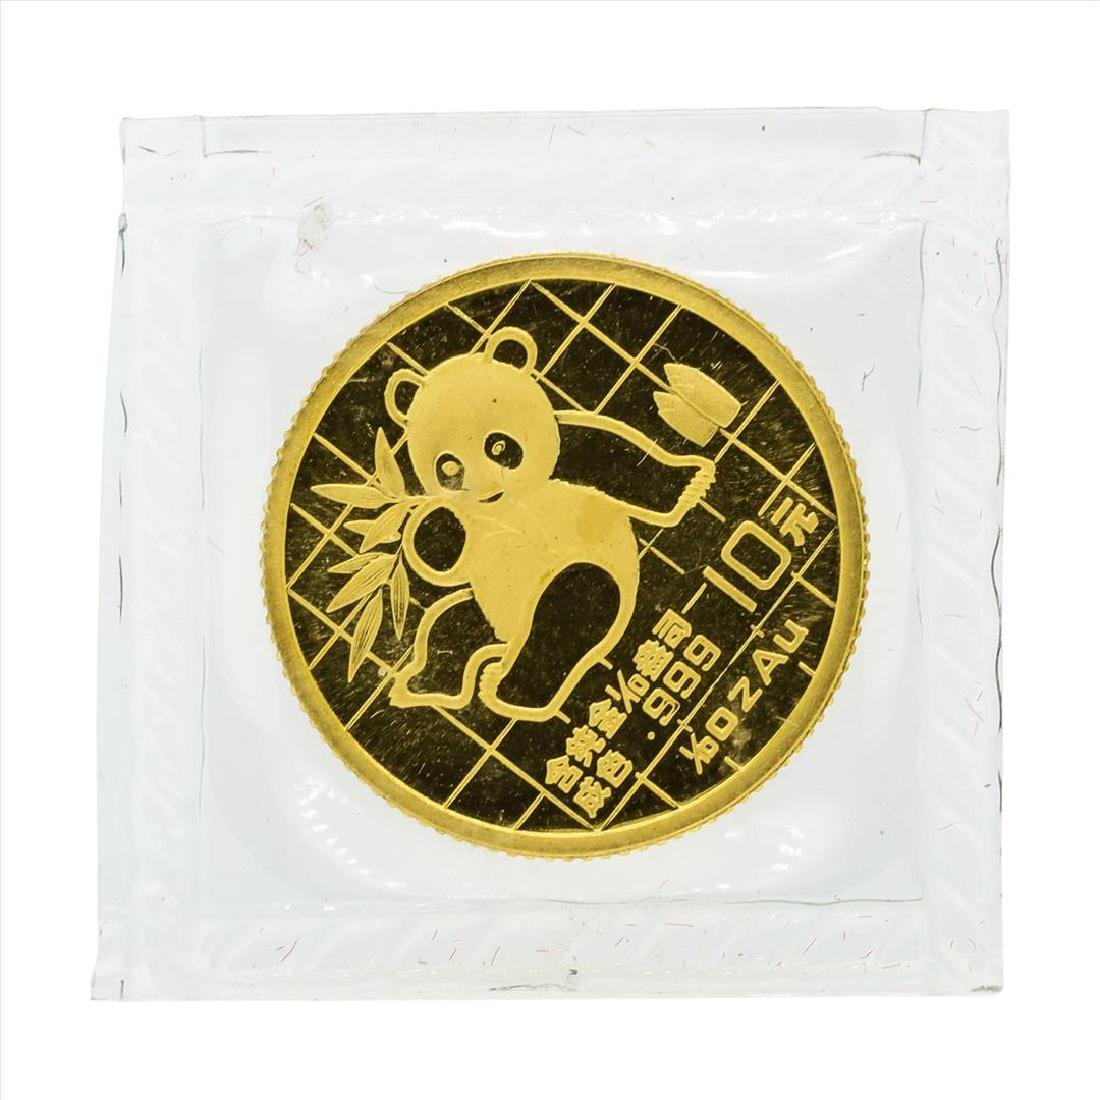 1989 10 Yuan China Panda 1/10 oz Gold Coin